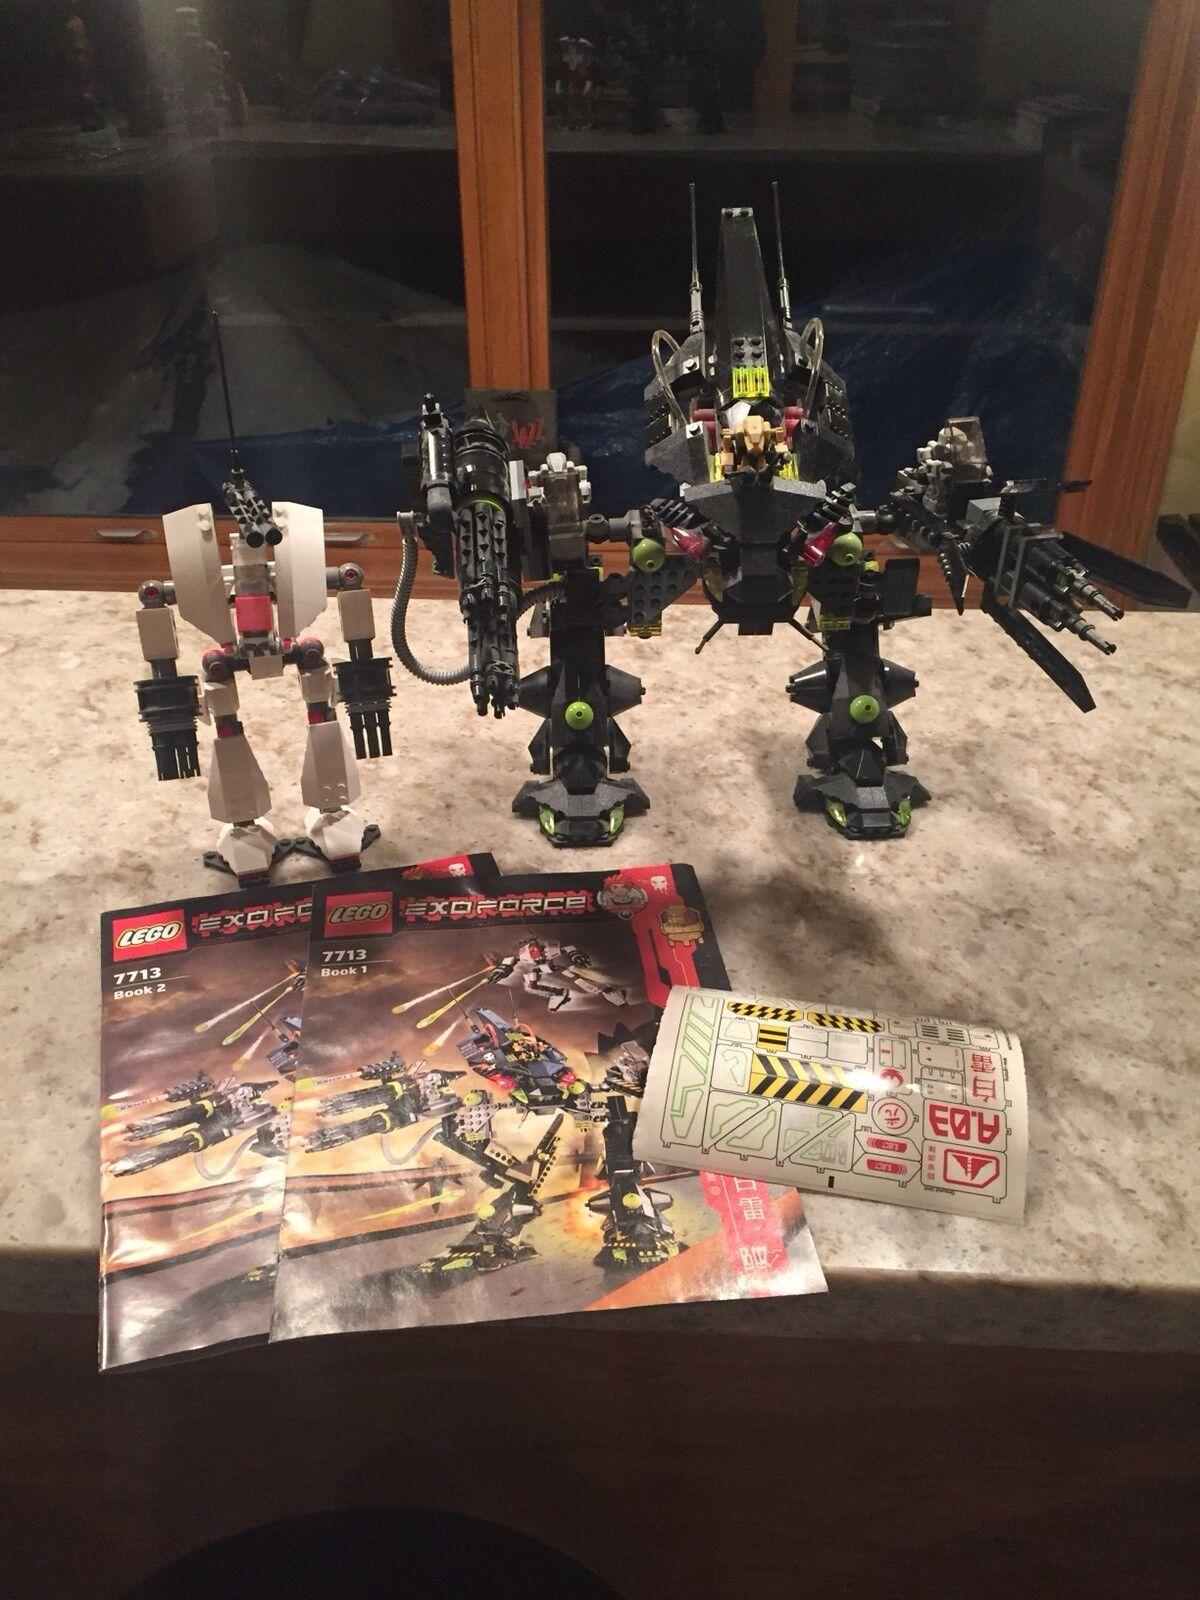 LEGO Exo-Force Robots Bridge Walker and Weiß Lightning (7713)